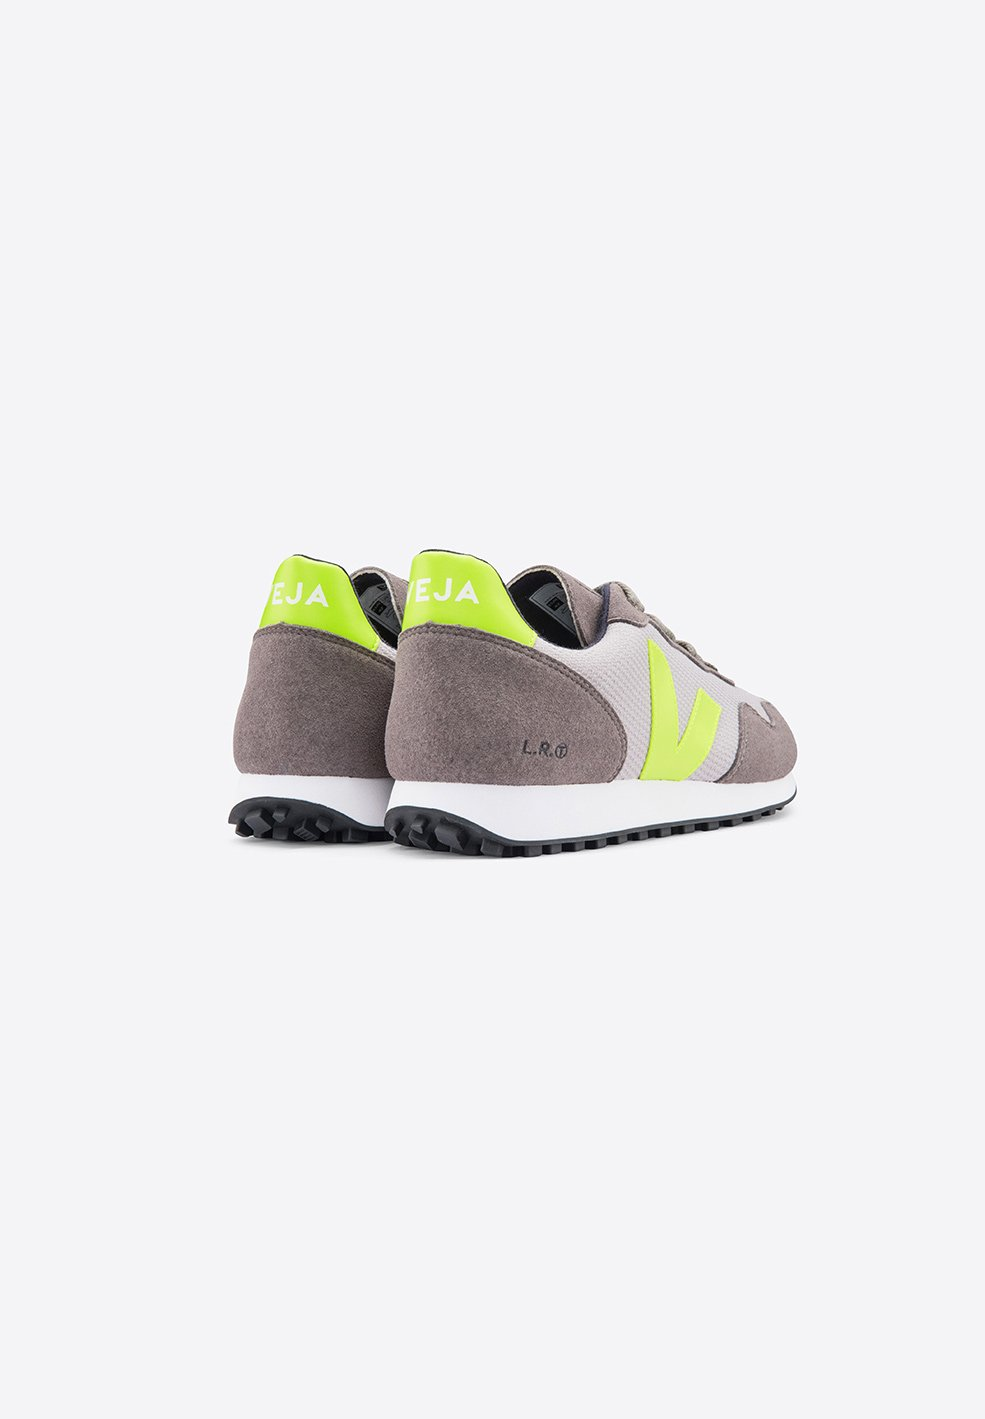 Veja Men SDU Recycled Mesh Silver Yellow Fluoro Sporty Sneakers